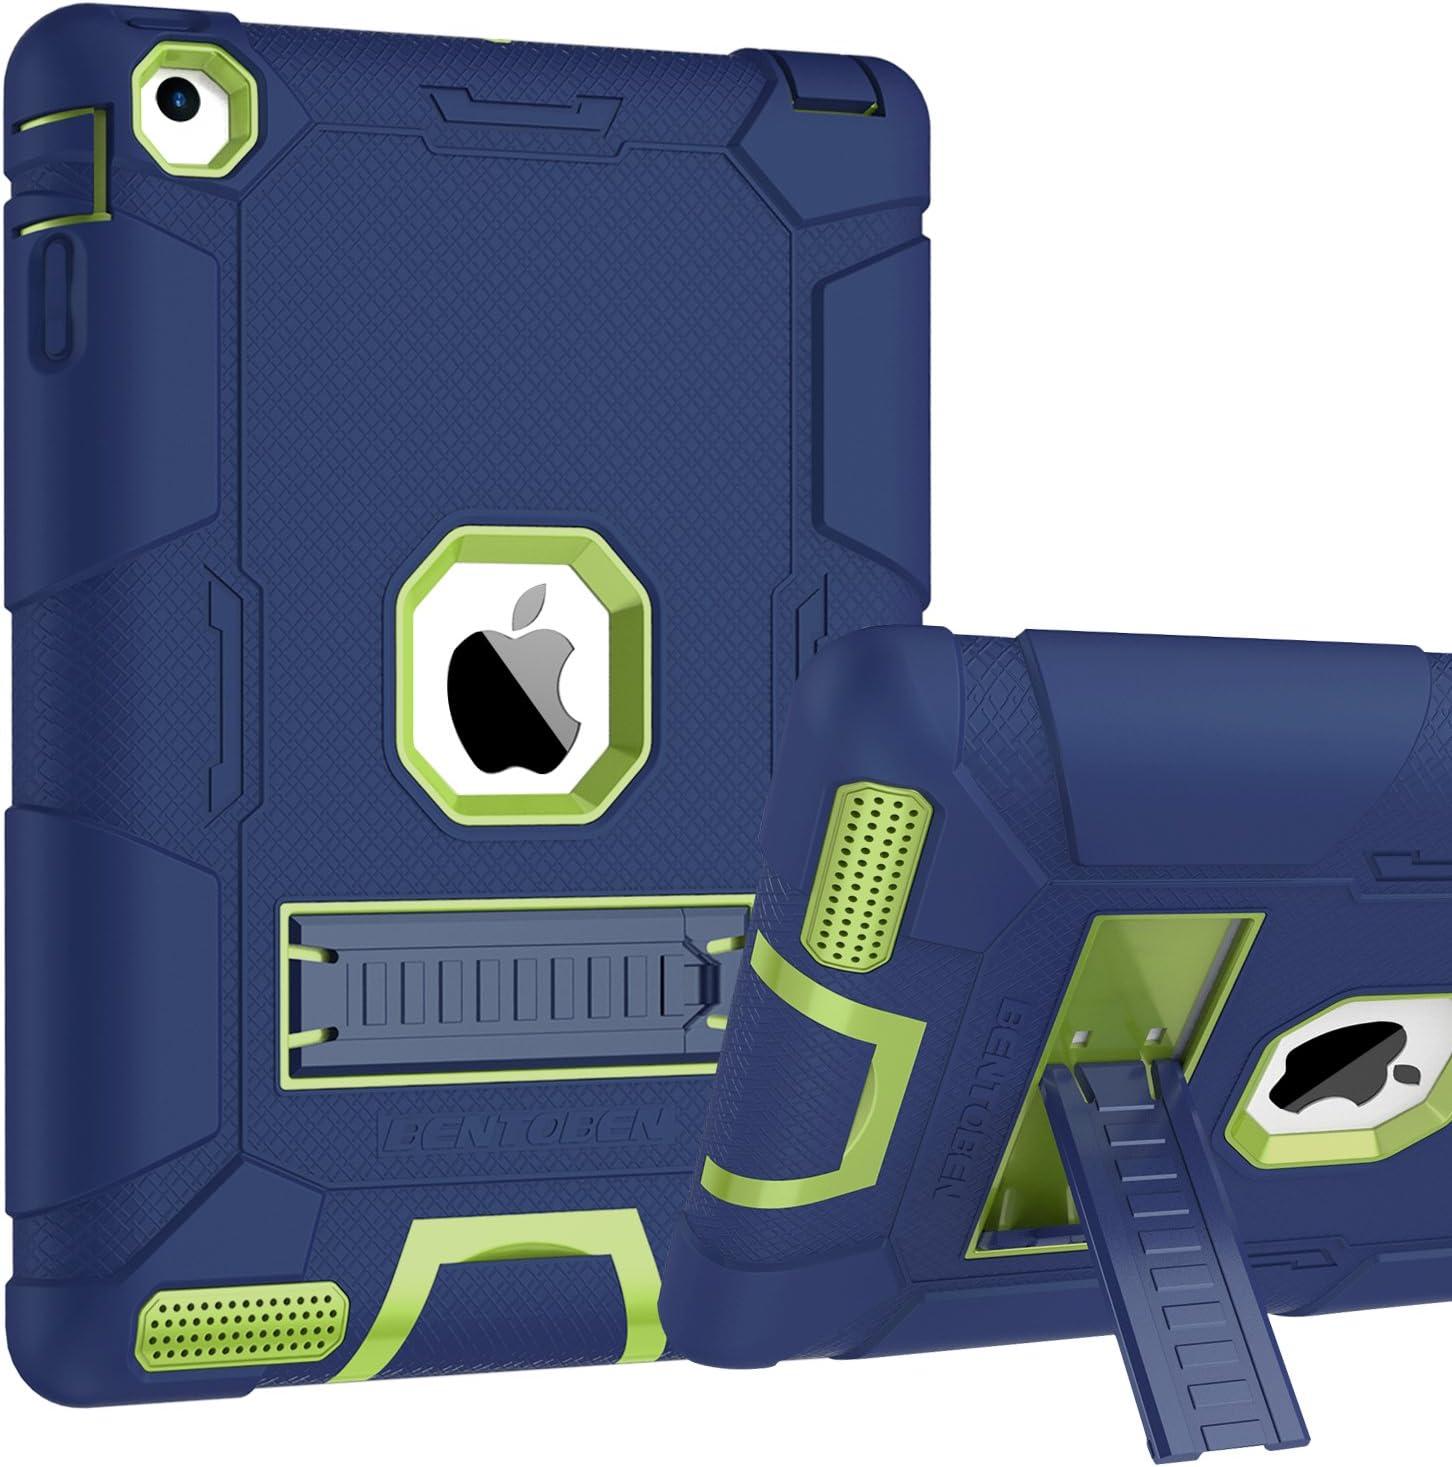 iPad 4 Case, iPad 2 Case, iPad 3 Case, BENTOBEN Kickstand Full-body 3 IN 1 Soft&Hard Protective Heavy Duty Rugged Shockproof Drop Resistance Anti-slip Cover for Apple iPad 2/3/4 Retina,Navy Blue/Green